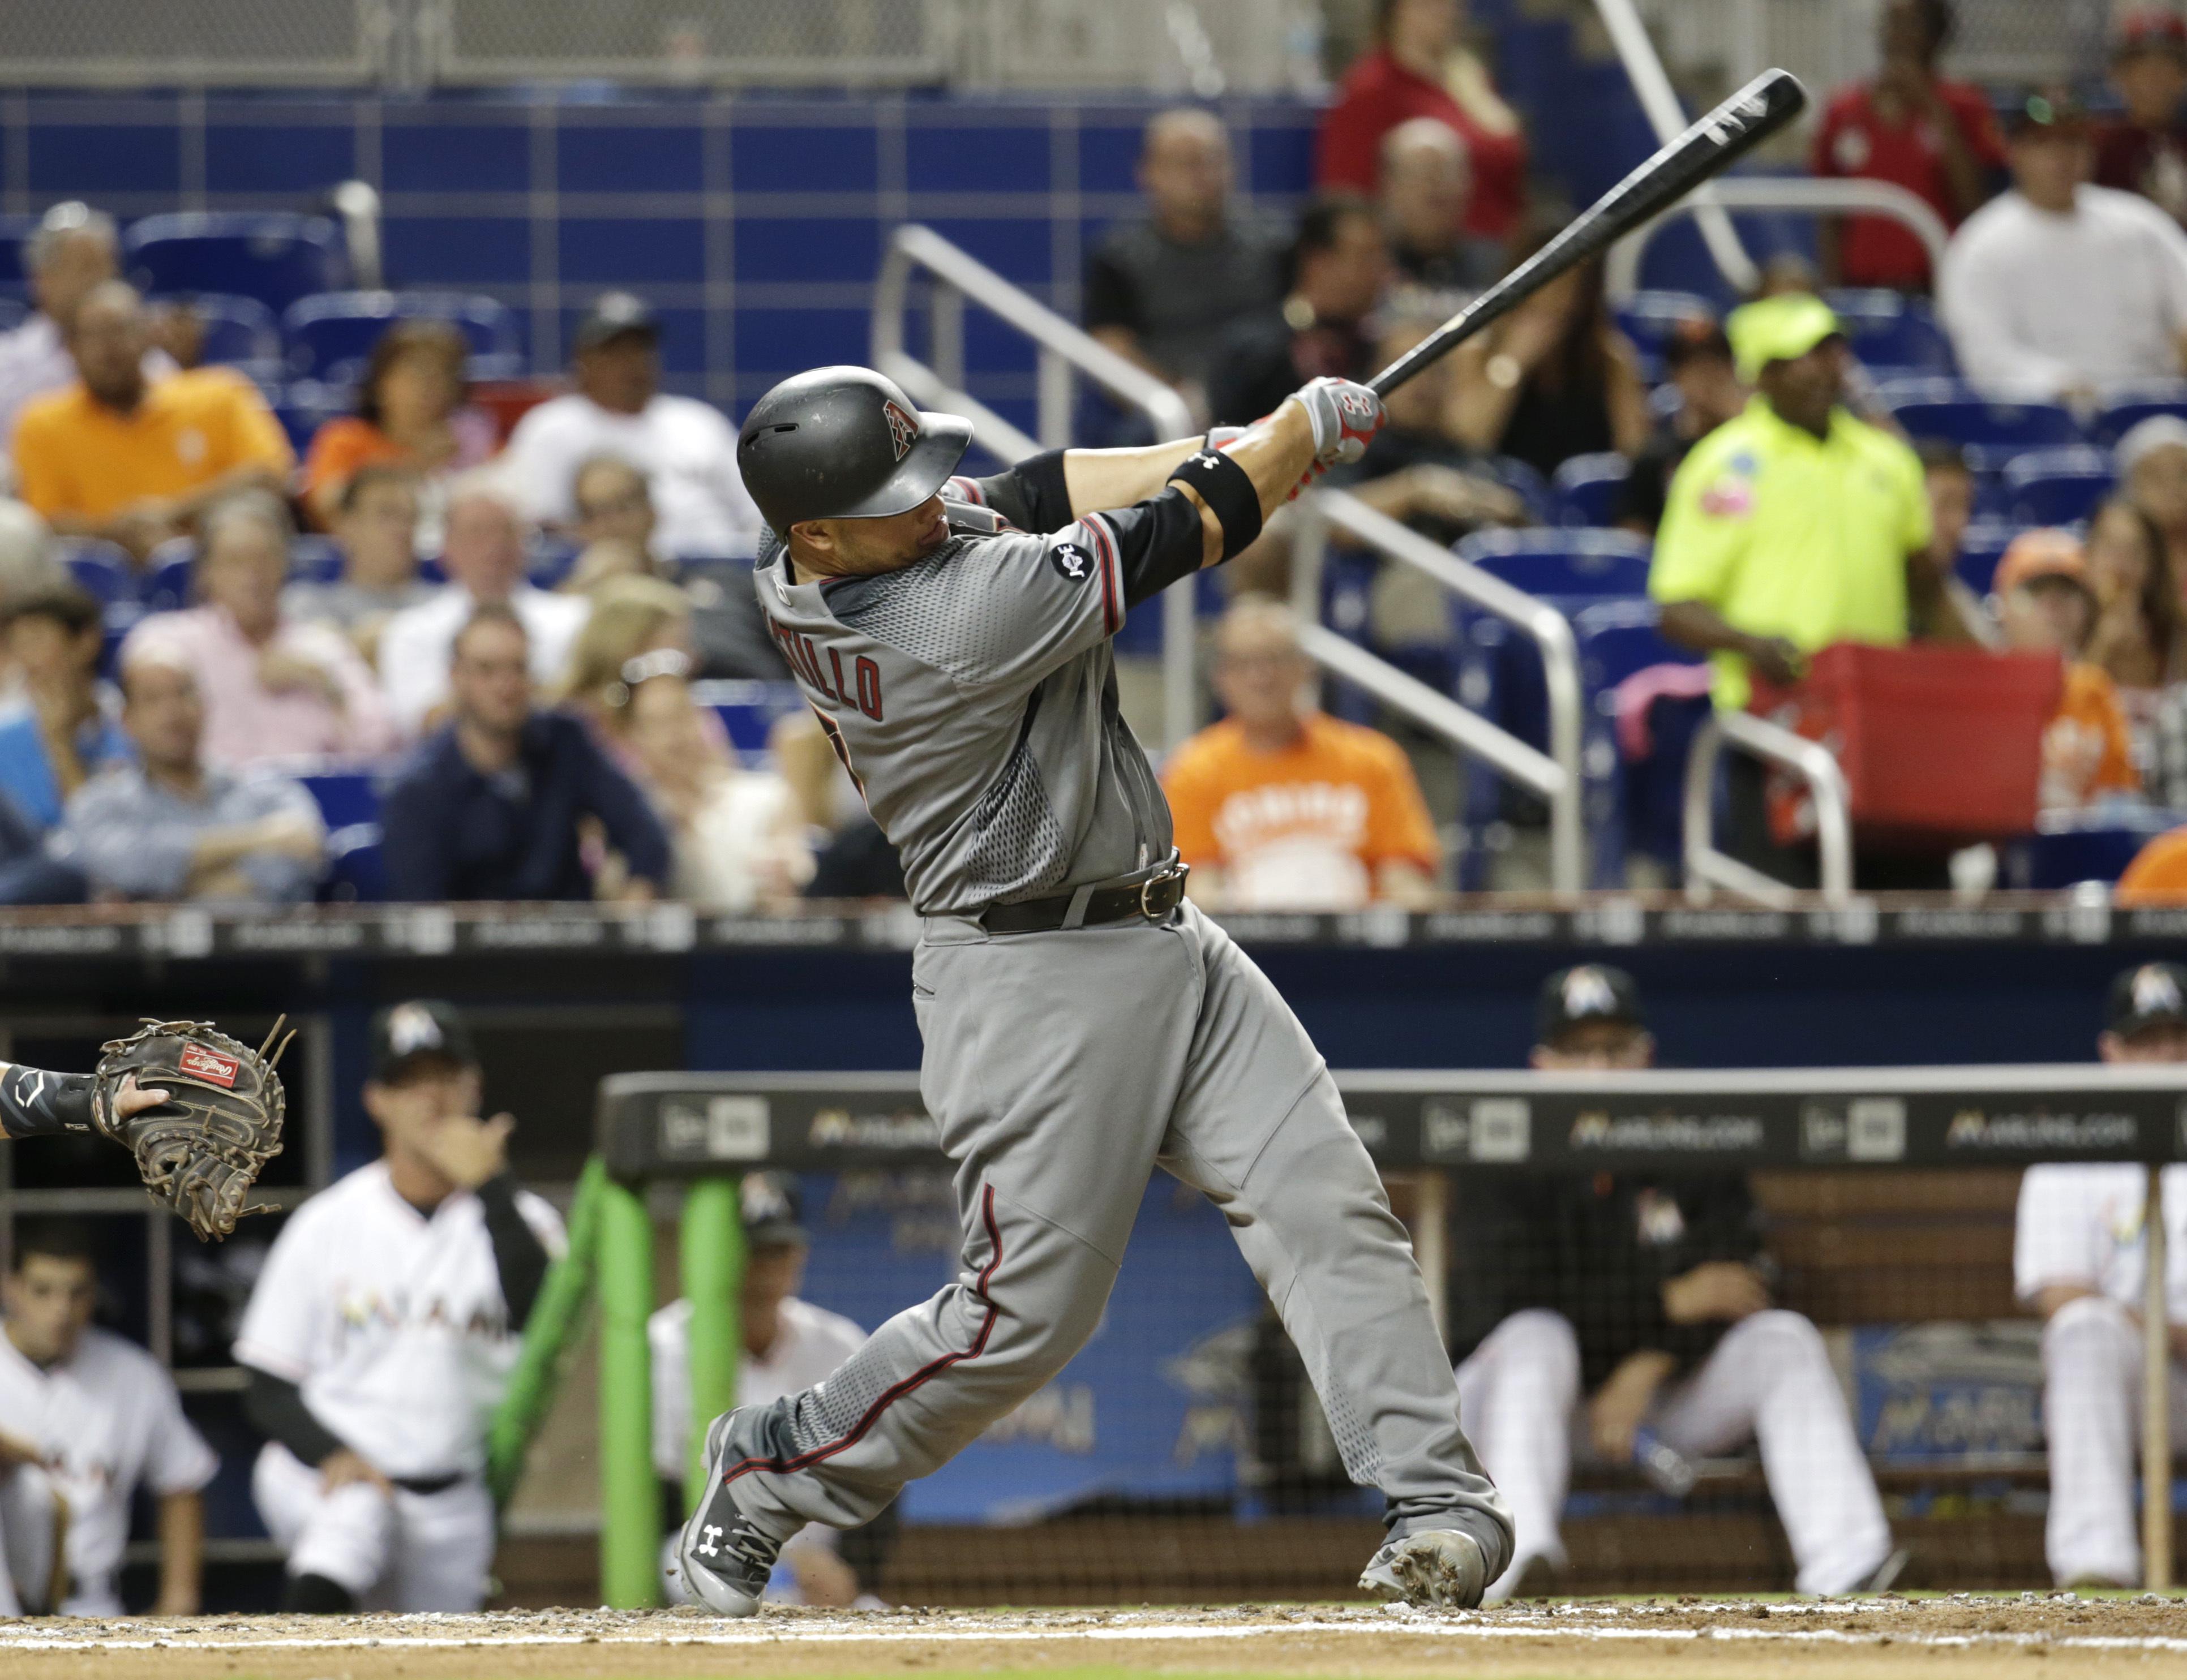 Arizona Diamondbacks' Welington Castillo hits a single during the fourth inning of a baseball game against the Miami Marlins, Thursday, May 5, 2016, in Miami. (AP Photo/Lynne Sladky)